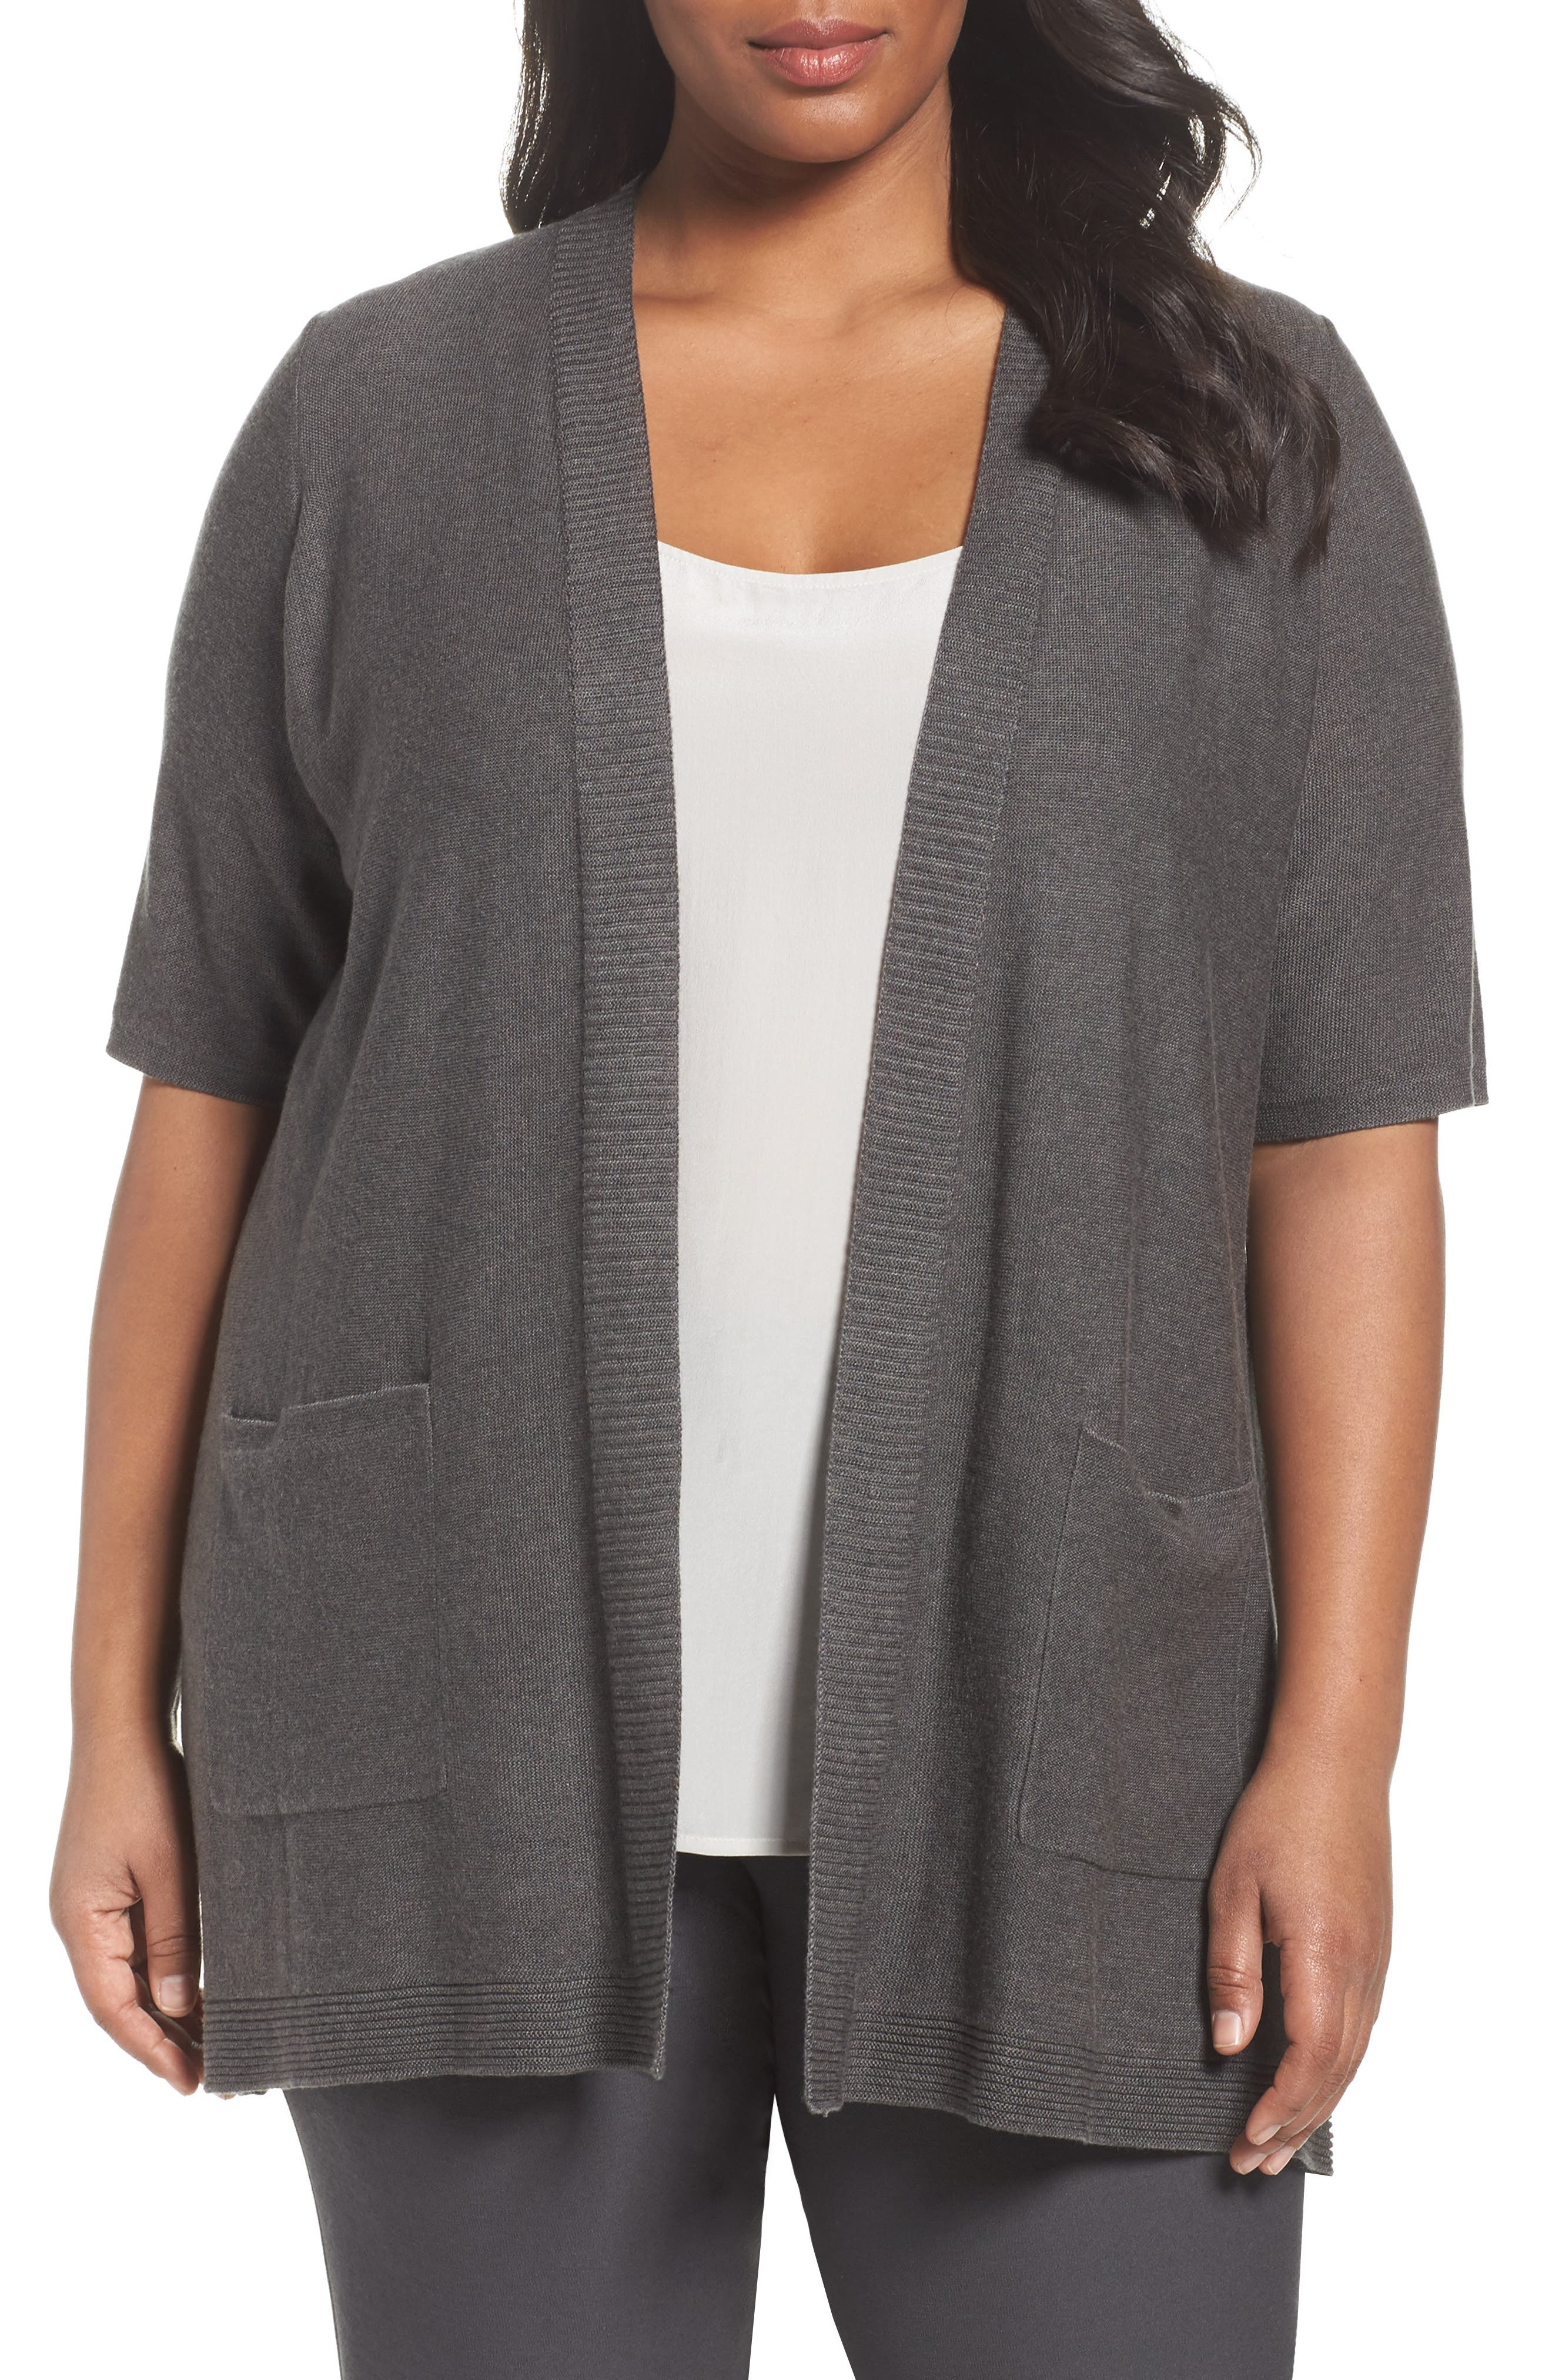 Eileen Fisher Simple Tencel® & Merino Wool Cardigan (Plus Size)